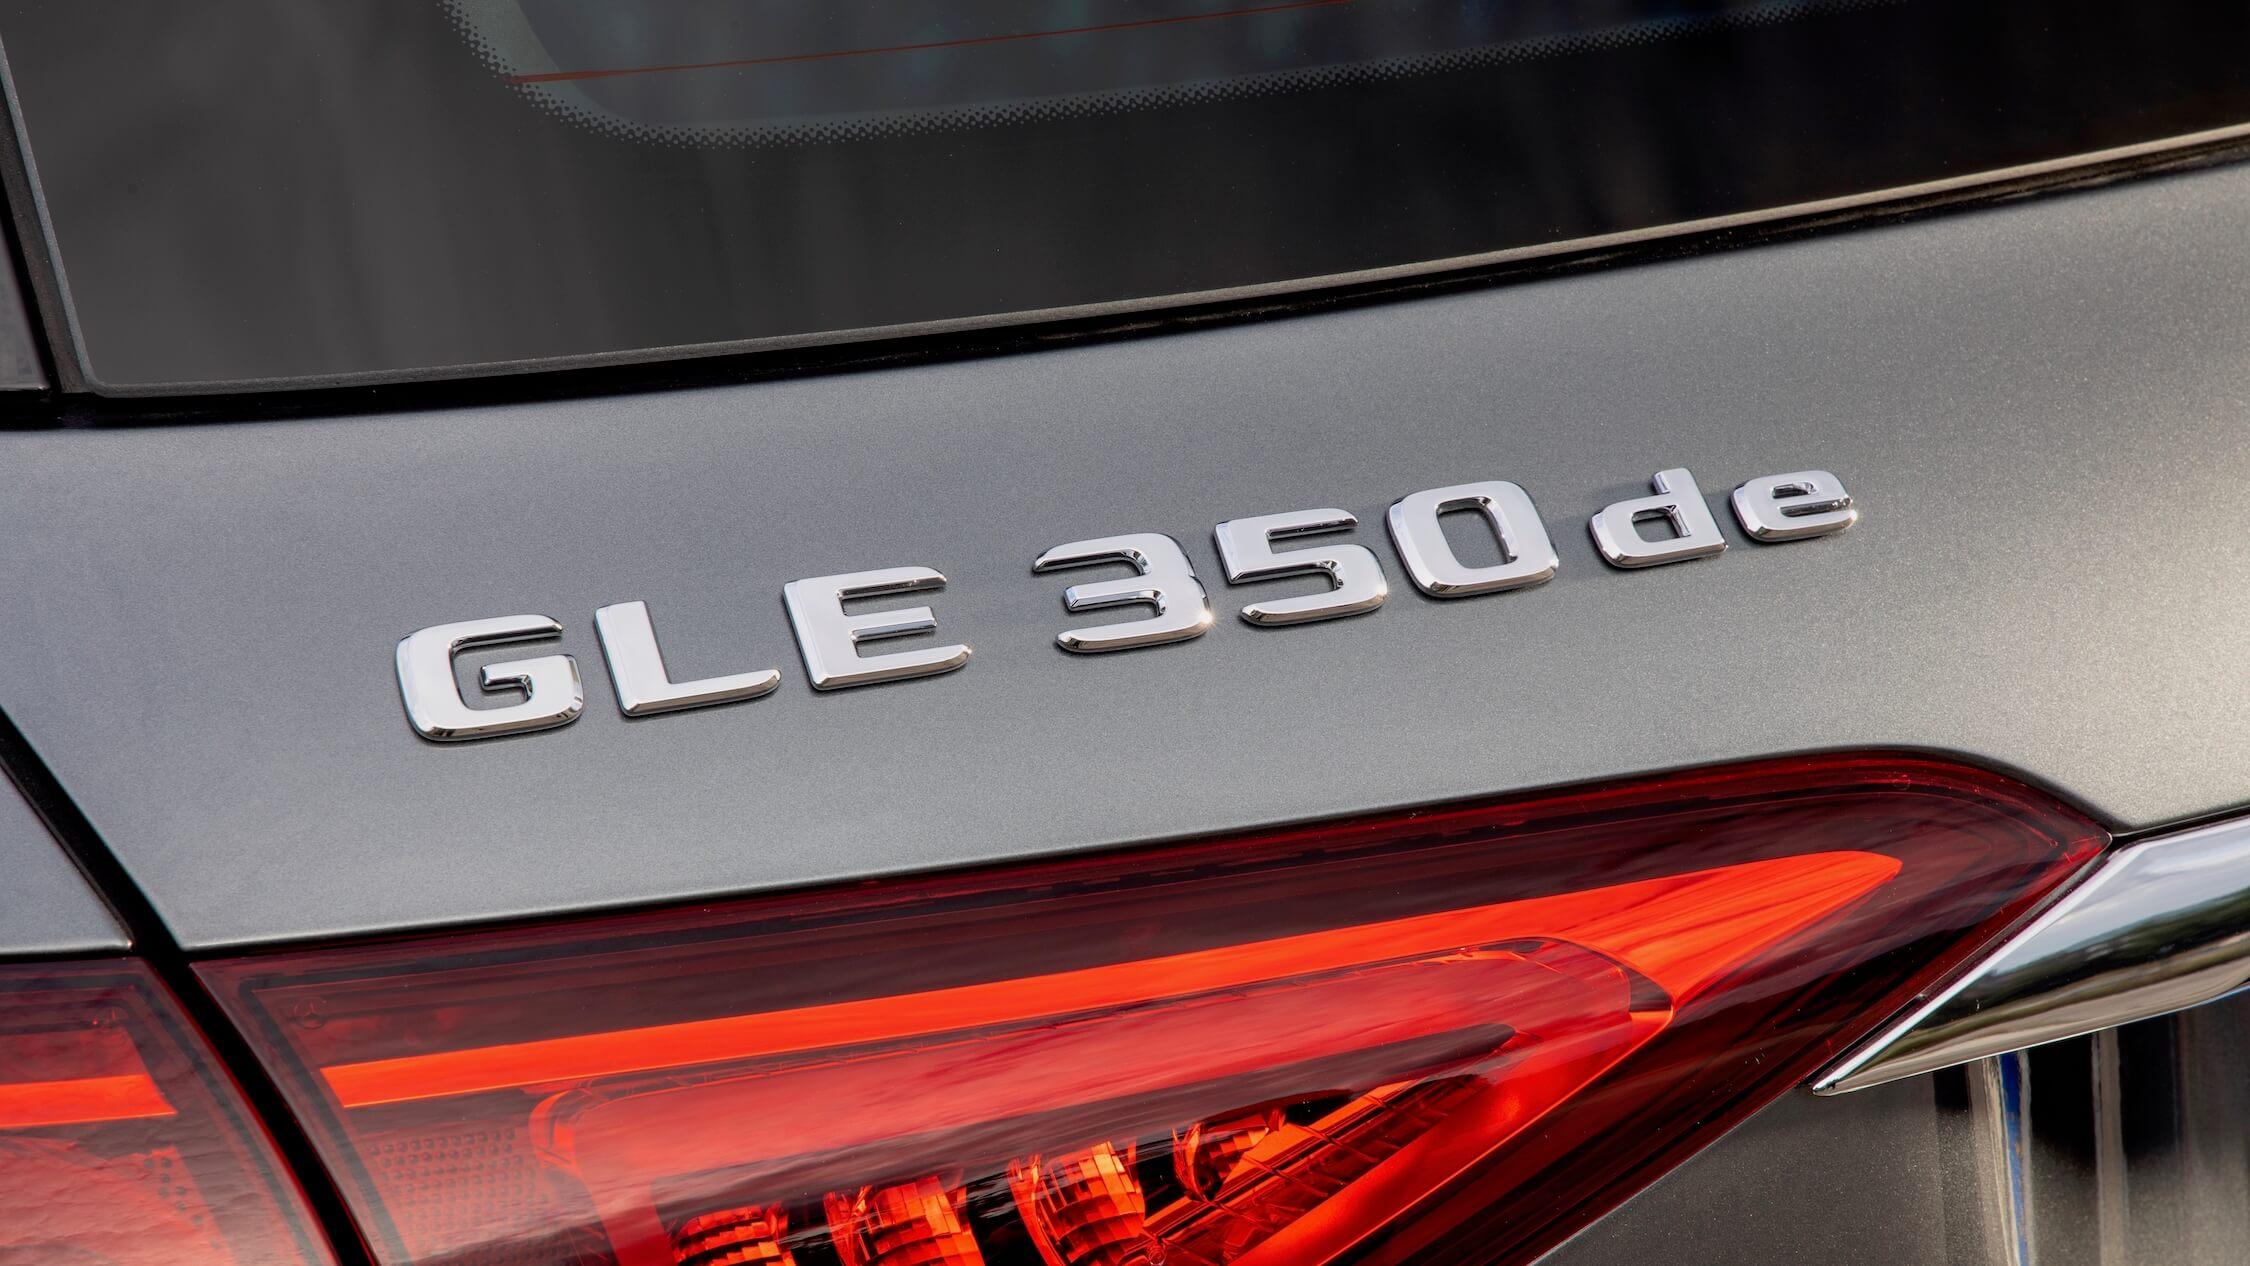 Mercedes GLE 350de logo